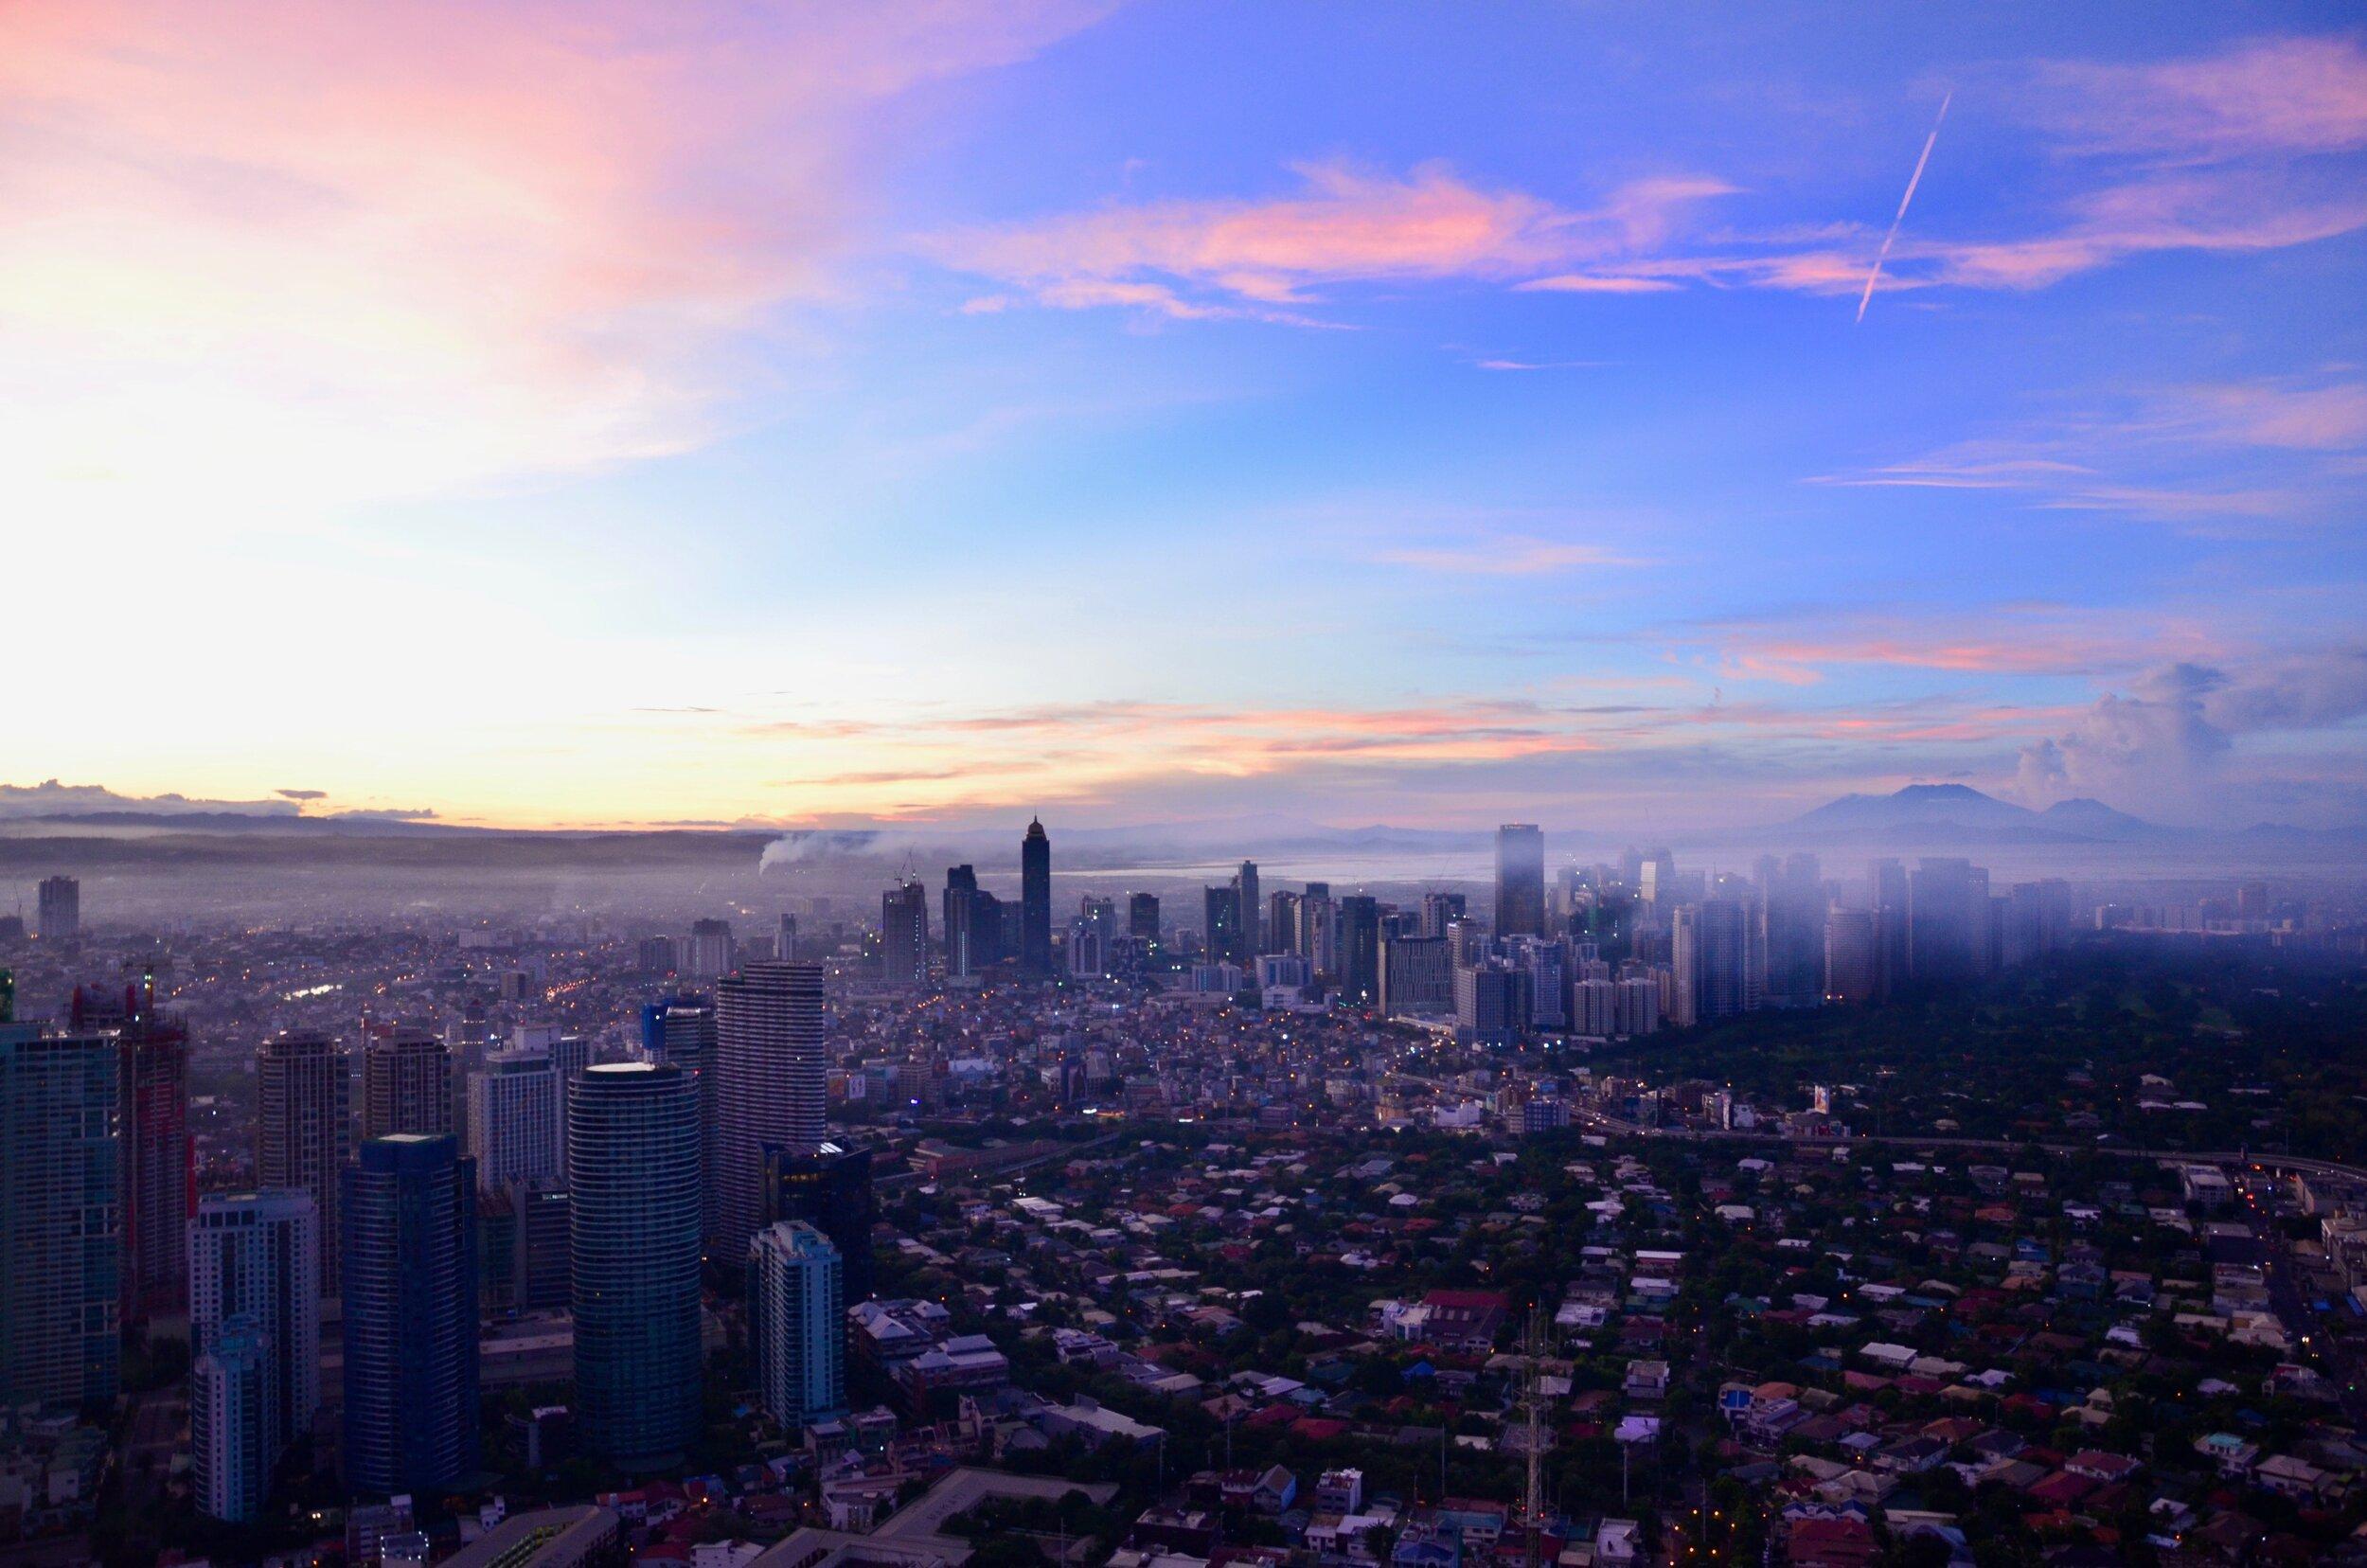 PHILIPPINESDECEMBER 26-JANUARY 2 -